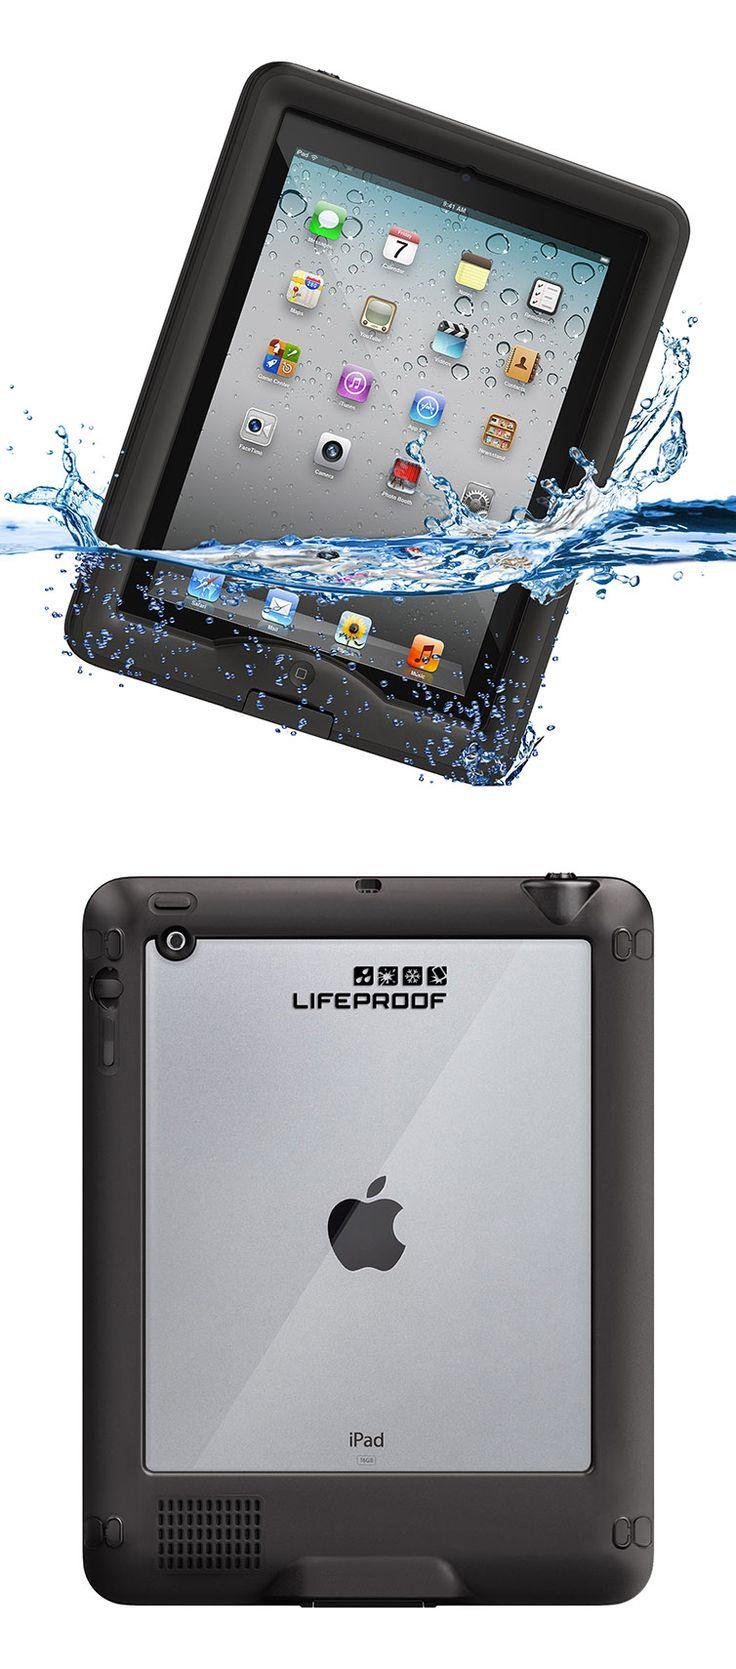 The Lifeproof iPad Case